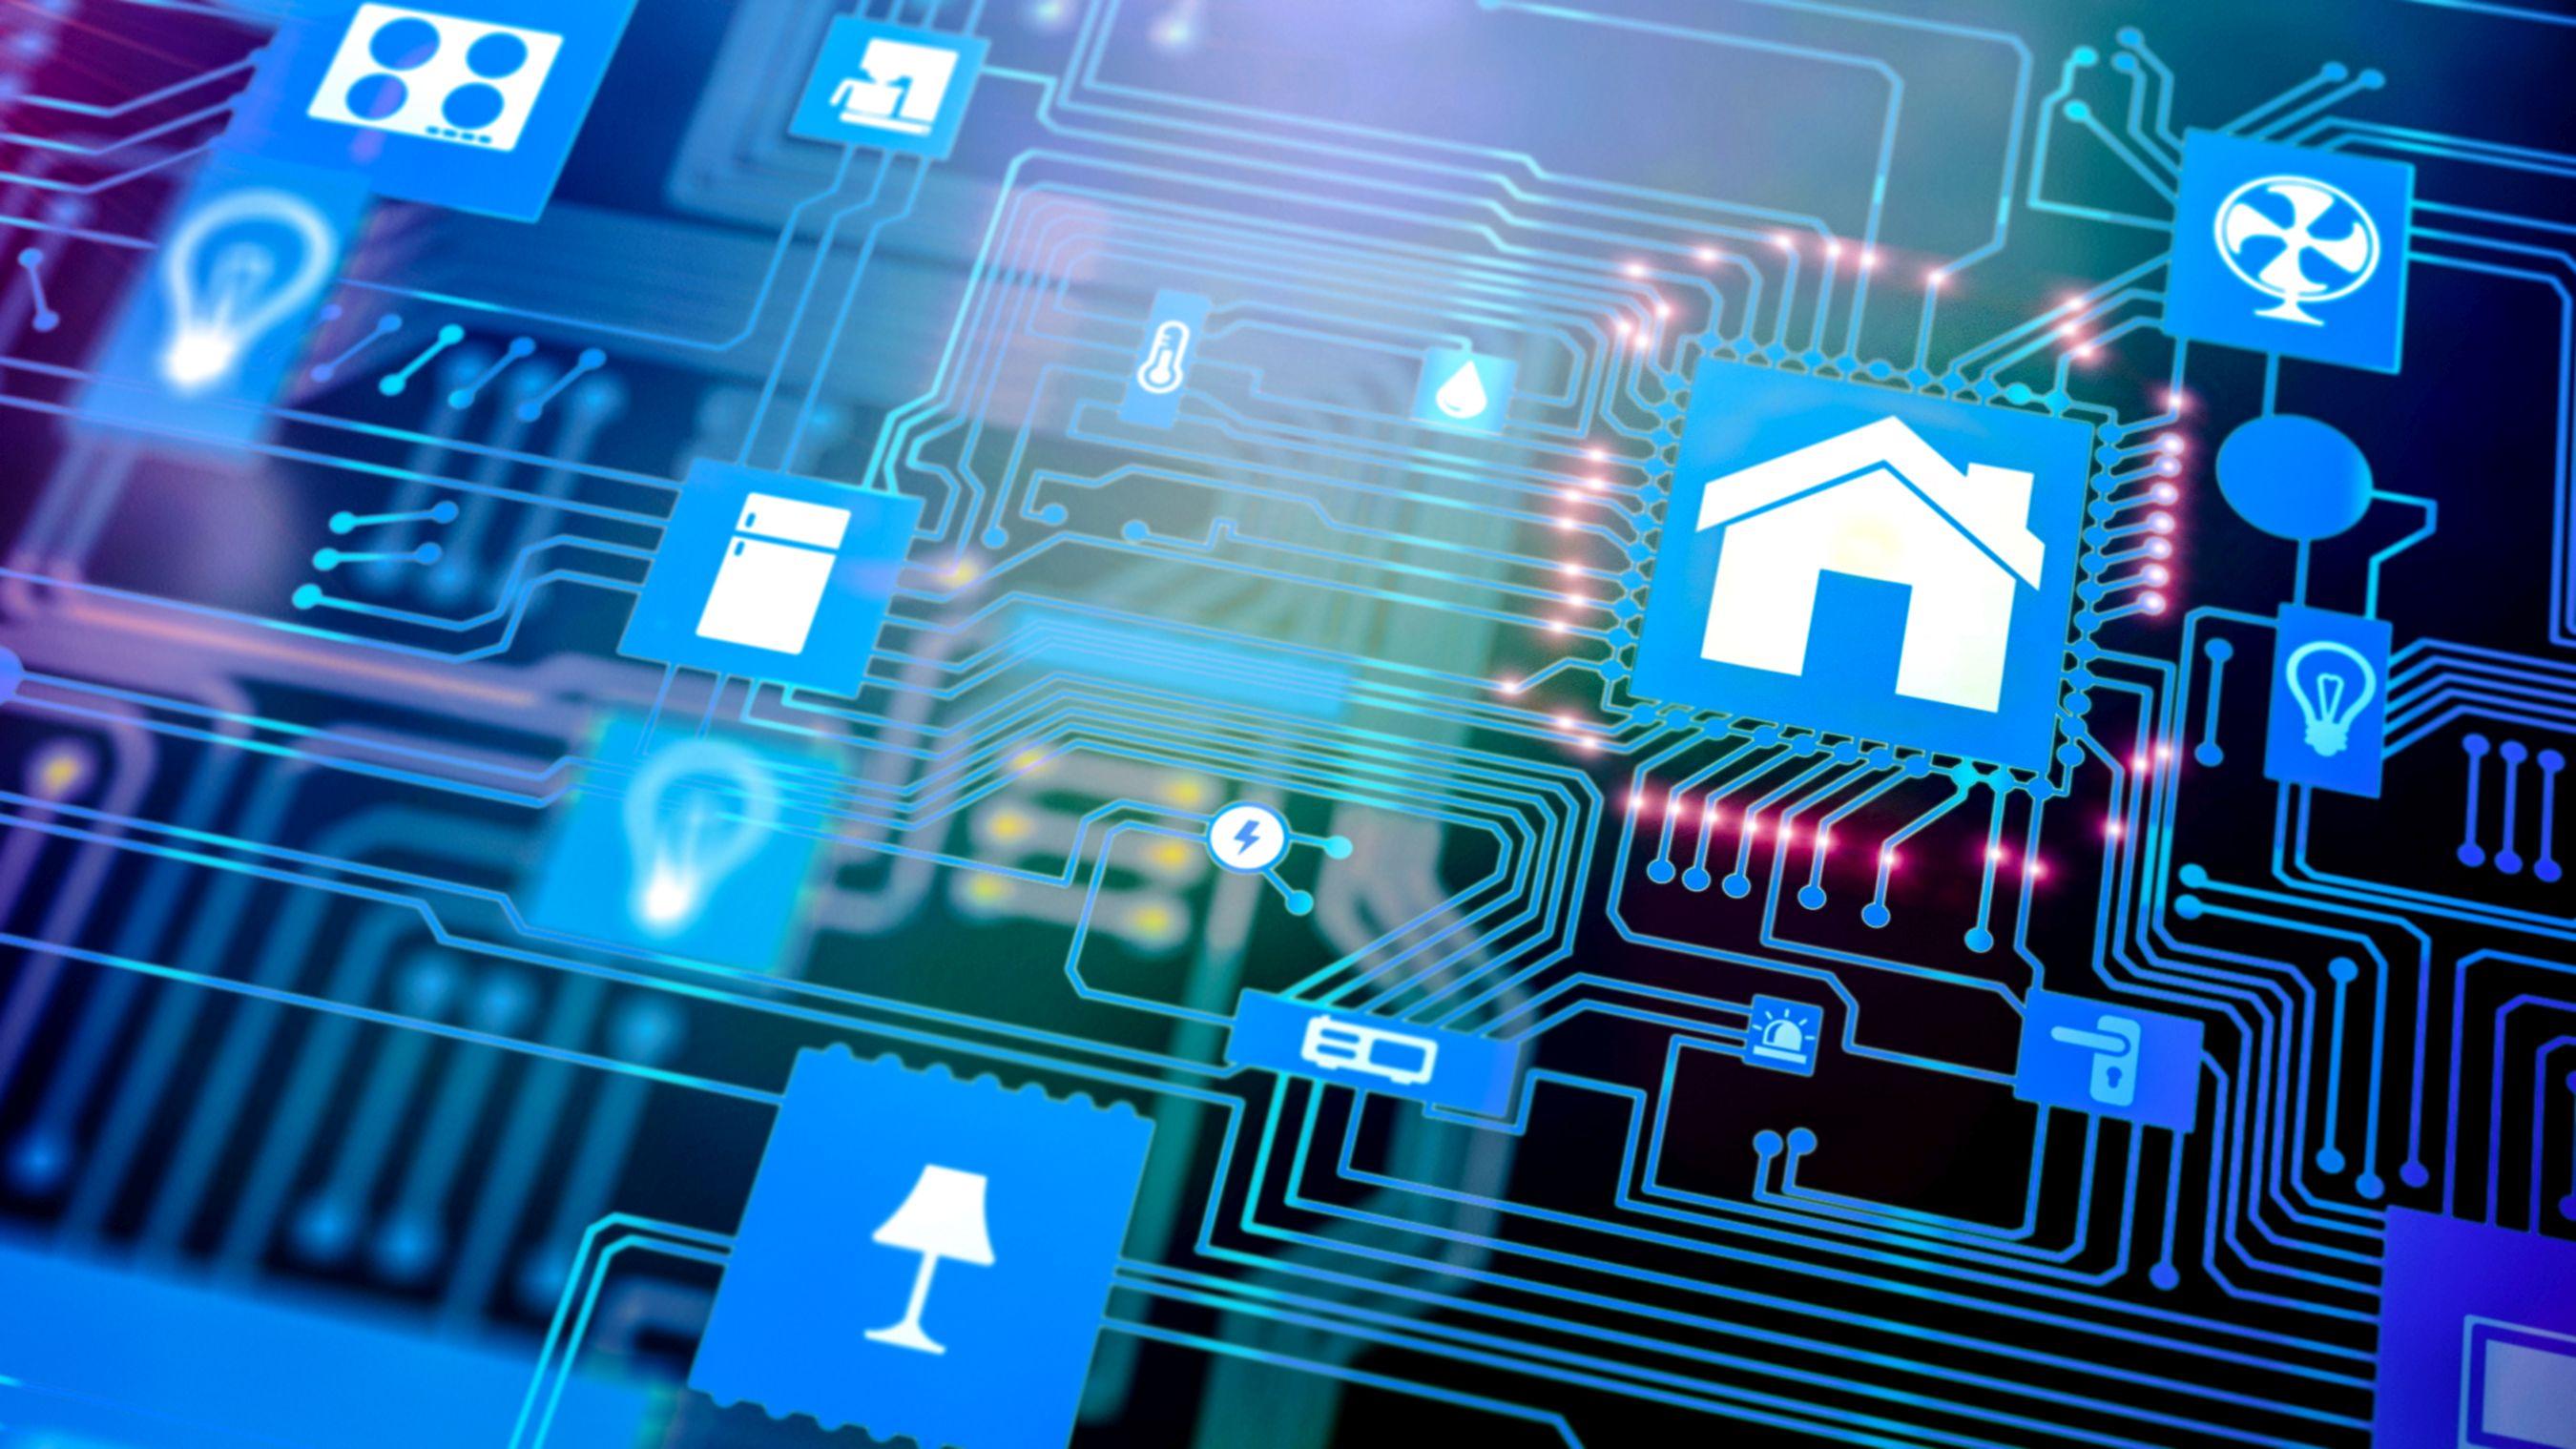 smart home vernetztes zuhause effizienzhaus online. Black Bedroom Furniture Sets. Home Design Ideas